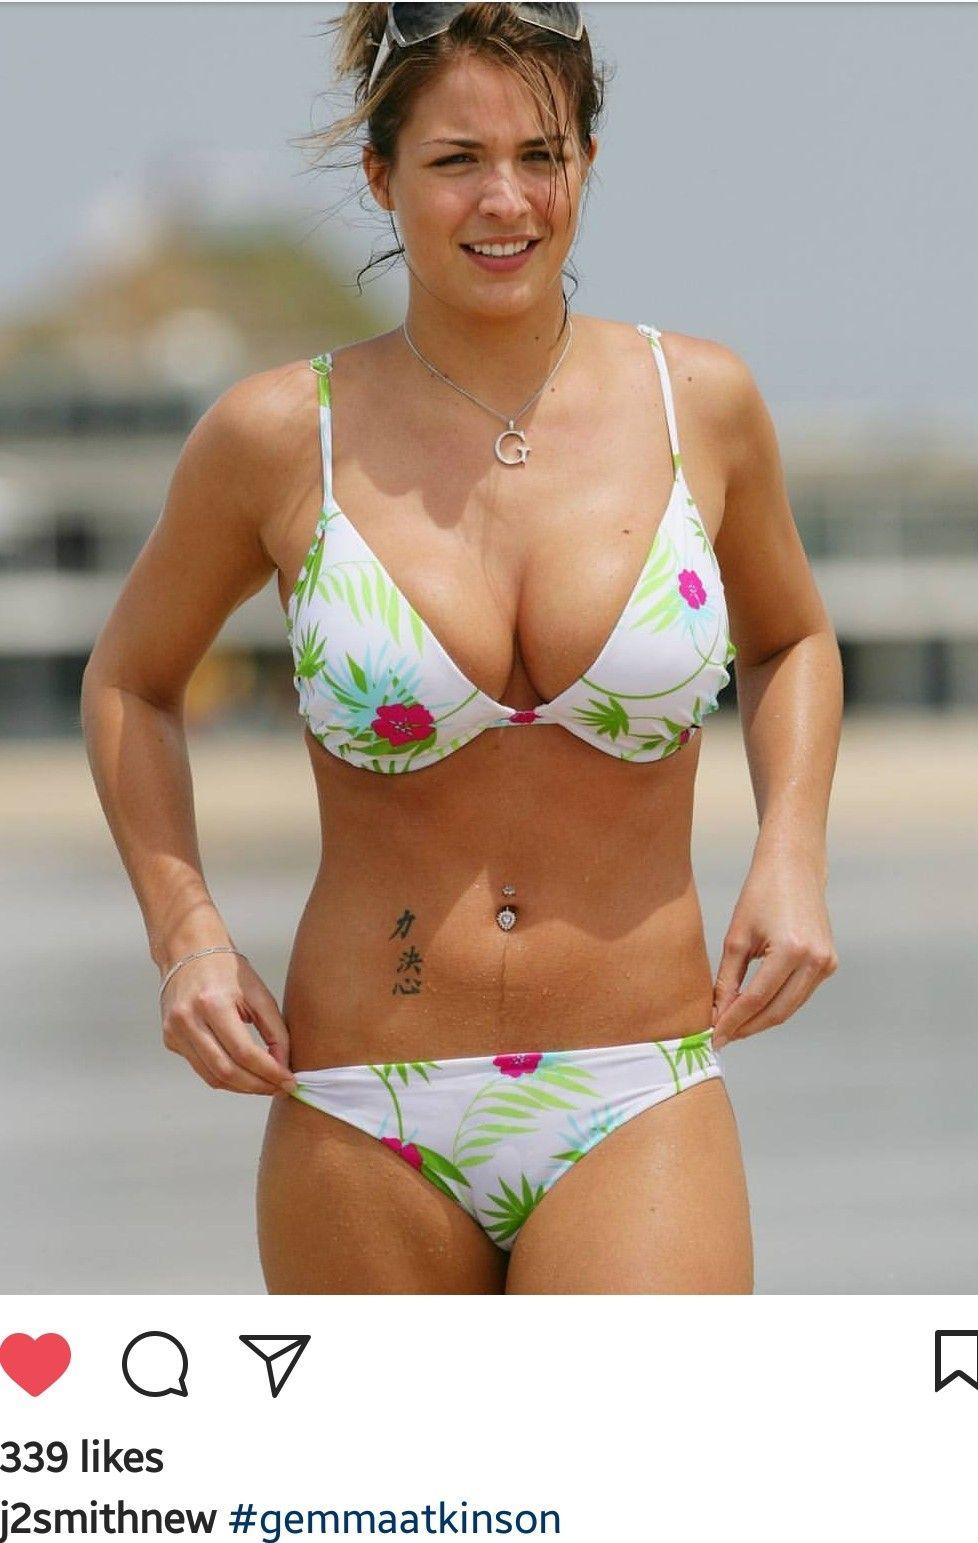 celebrities nude (17 photos) Ass, iCloud, in bikini